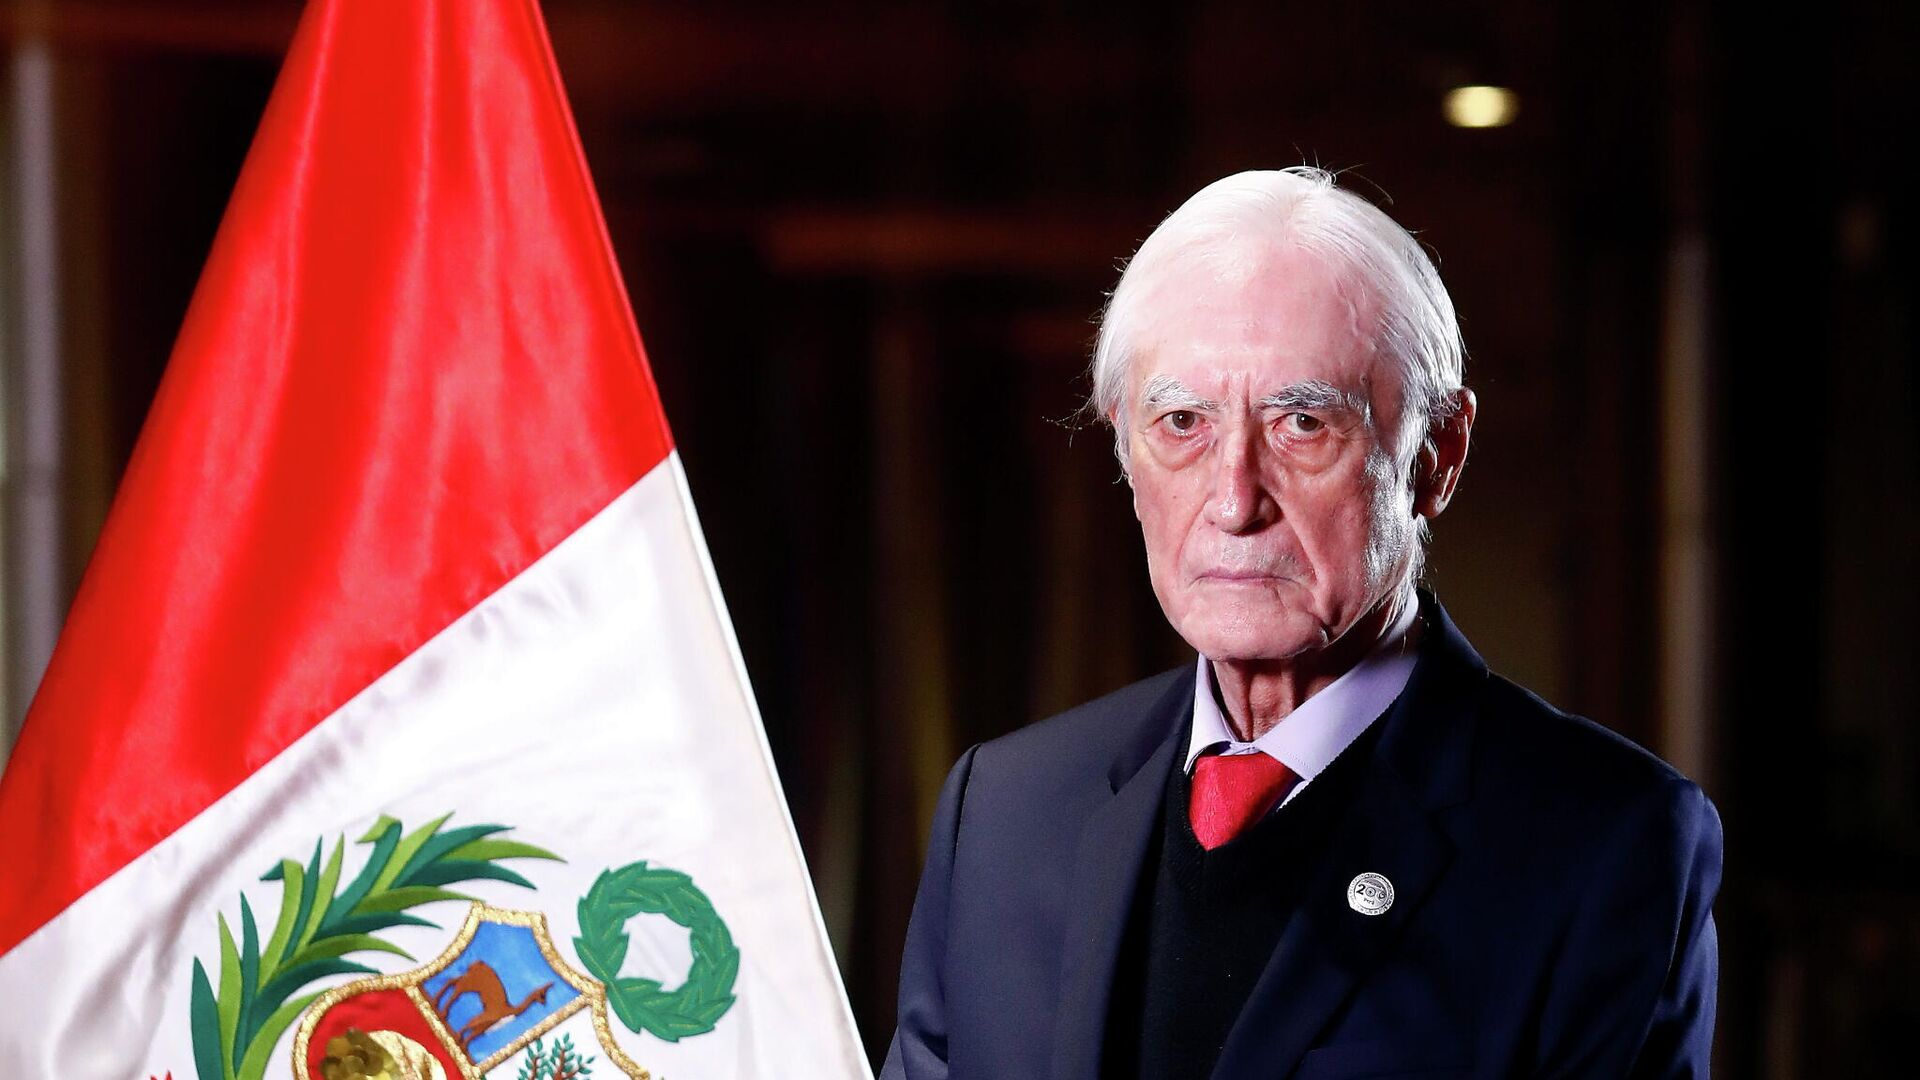 Héctor Béjar, canciller peruano - Sputnik Mundo, 1920, 17.08.2021